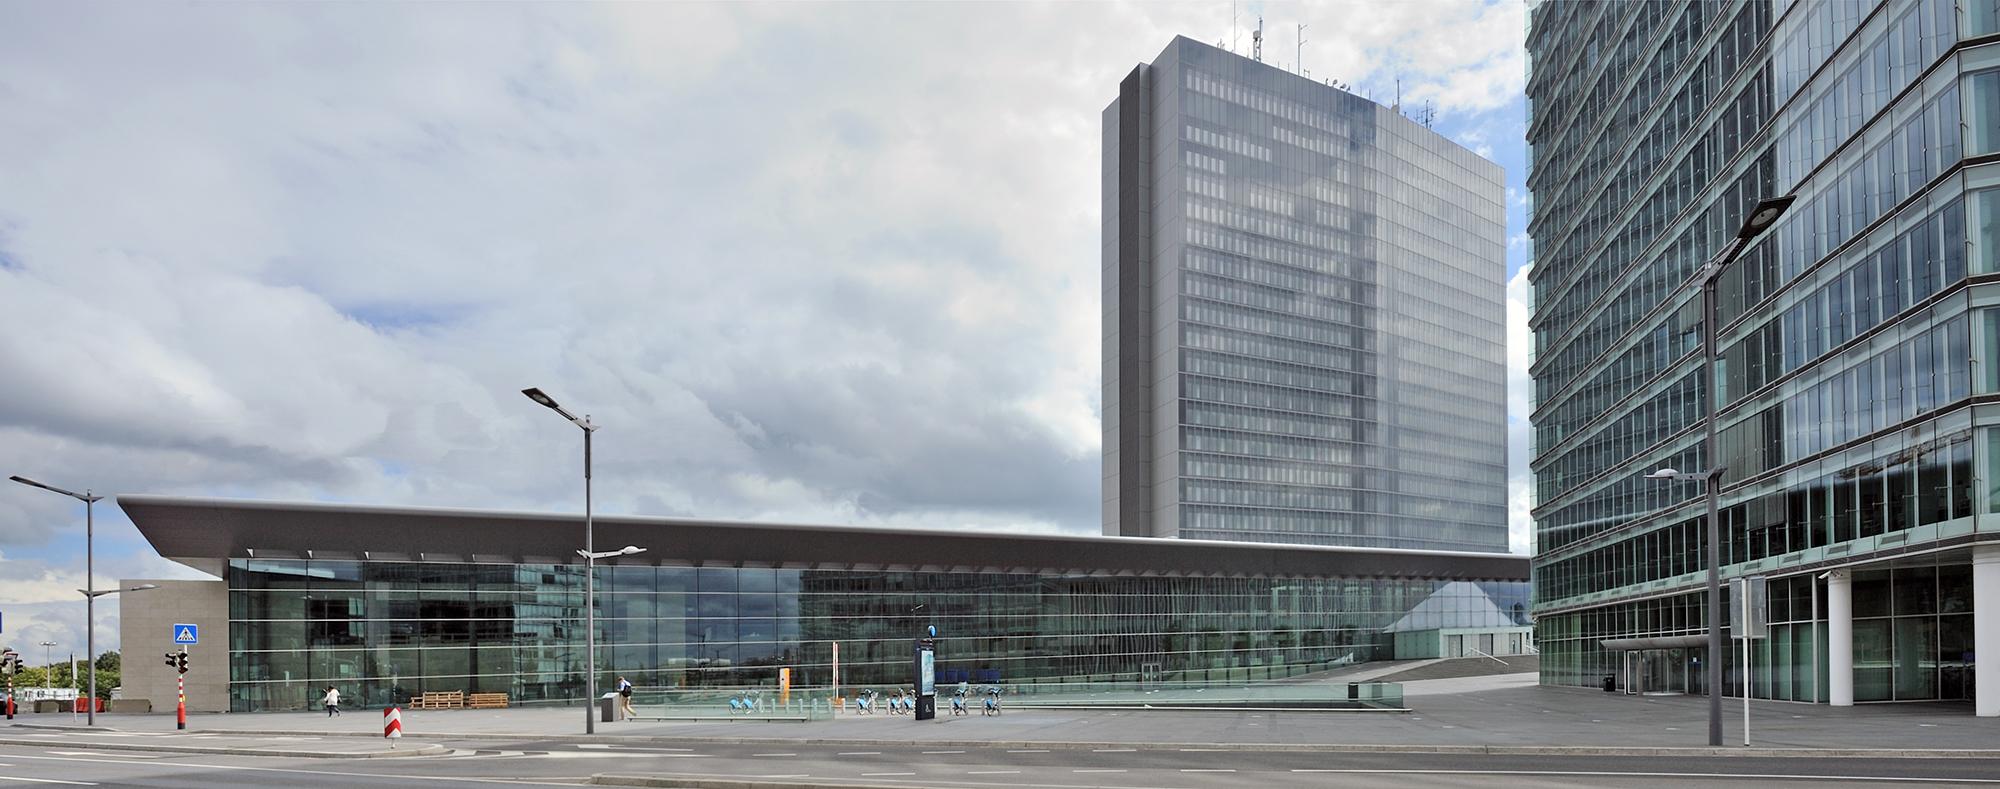 Luxembourg Nation Branding: Let's Make It Happen